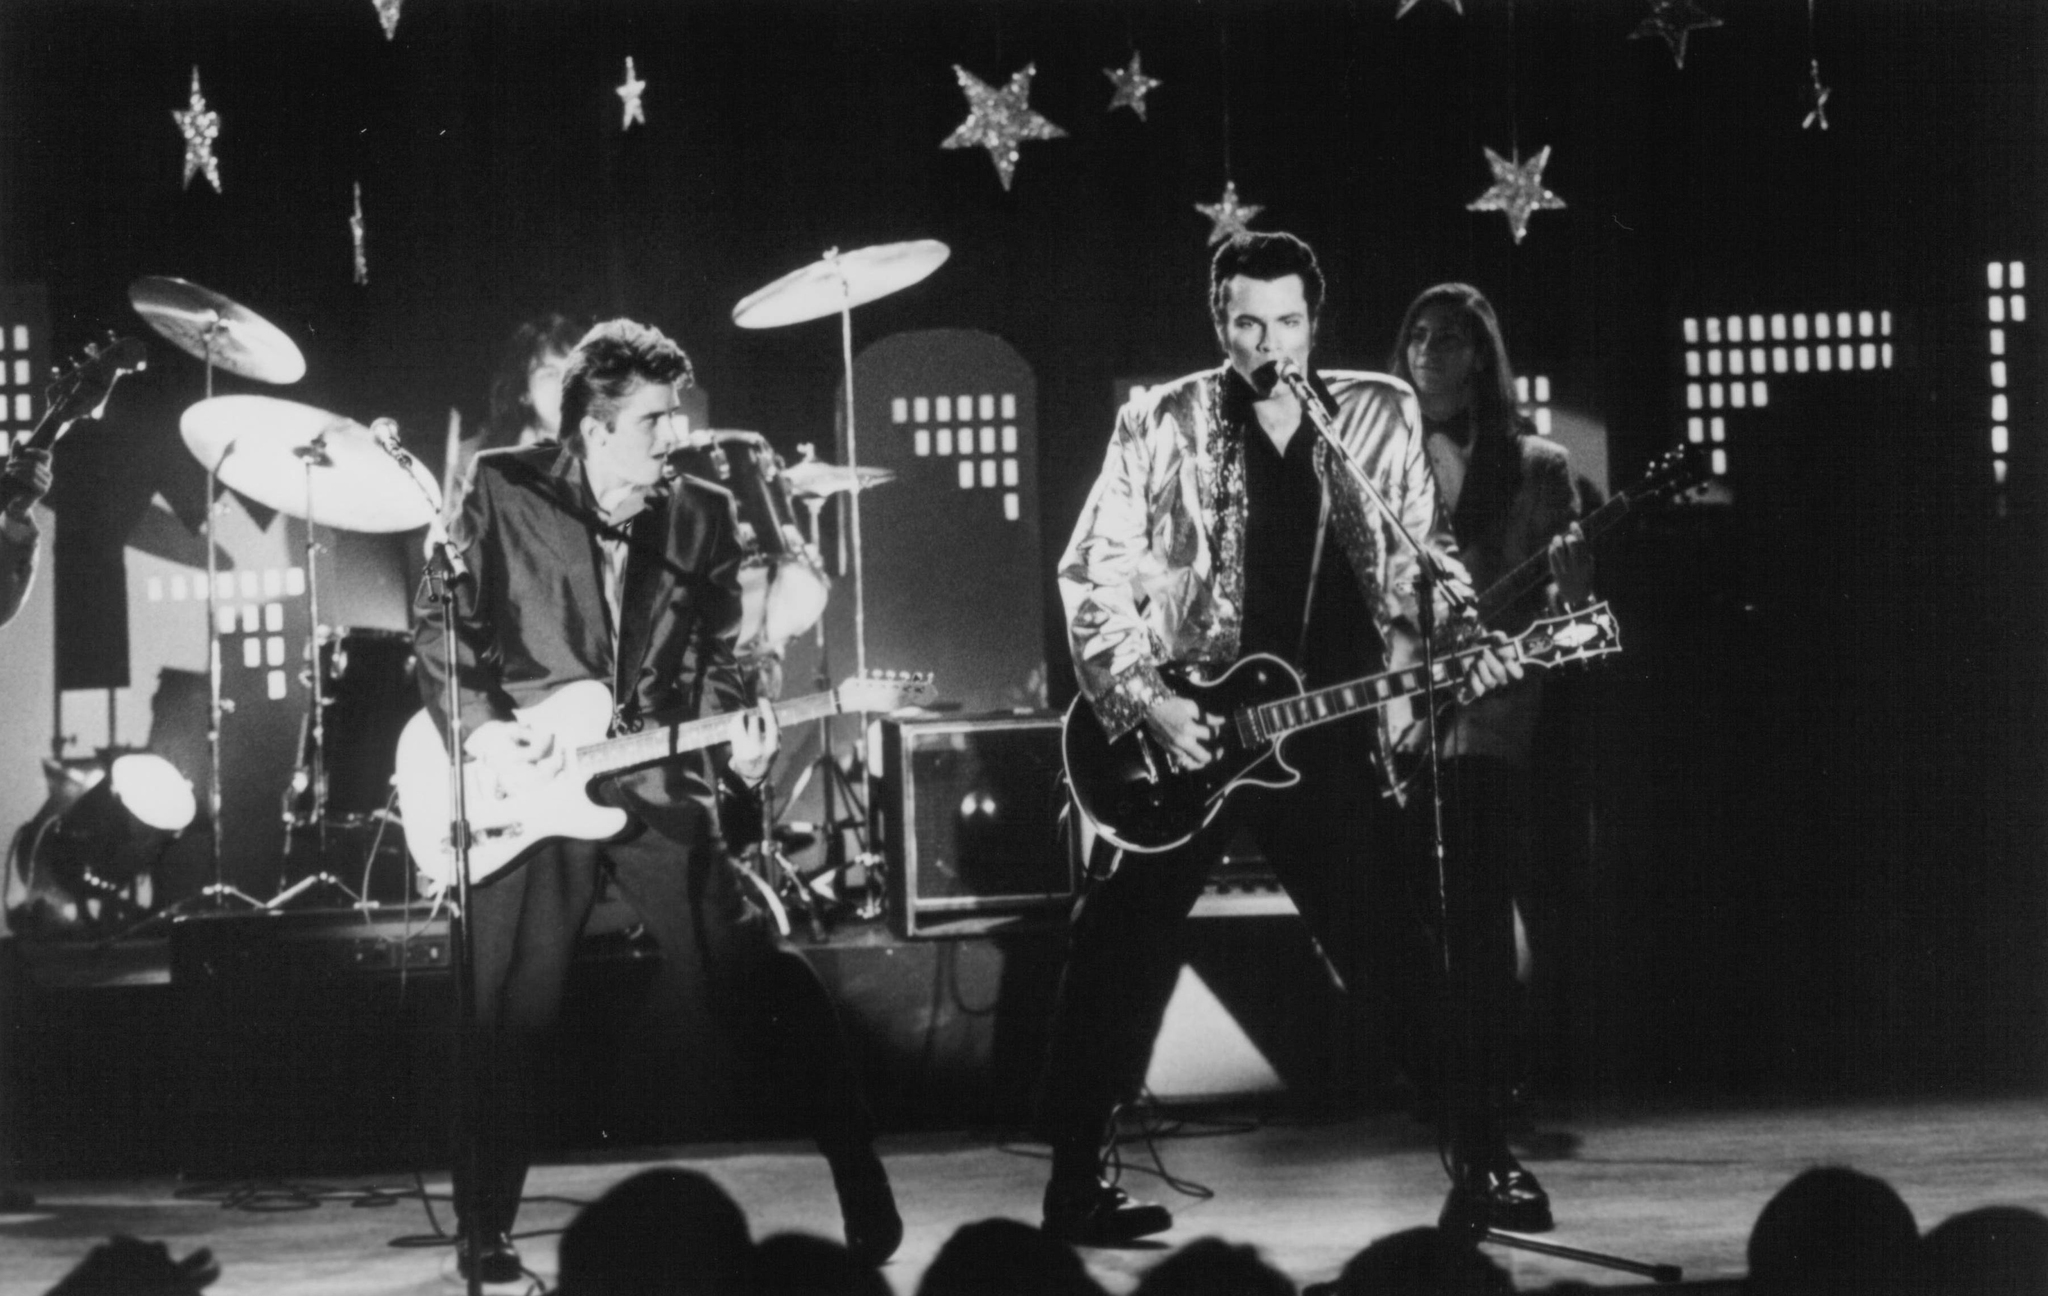 David Keith and Charlie Schlatter in Heartbreak Hotel (1988)